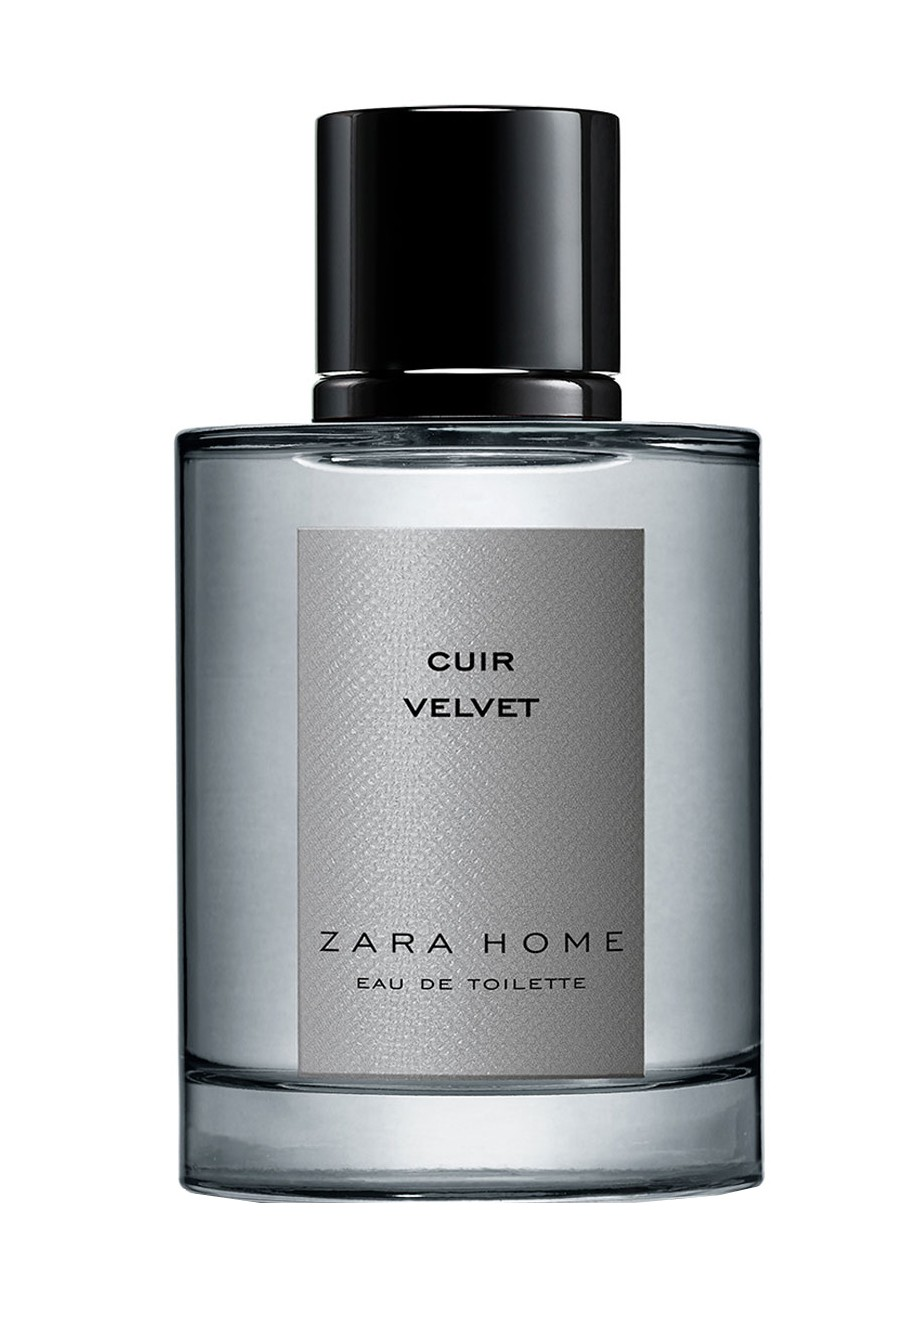 Zara Home Cuir Velvet аромат для мужчин и женщин